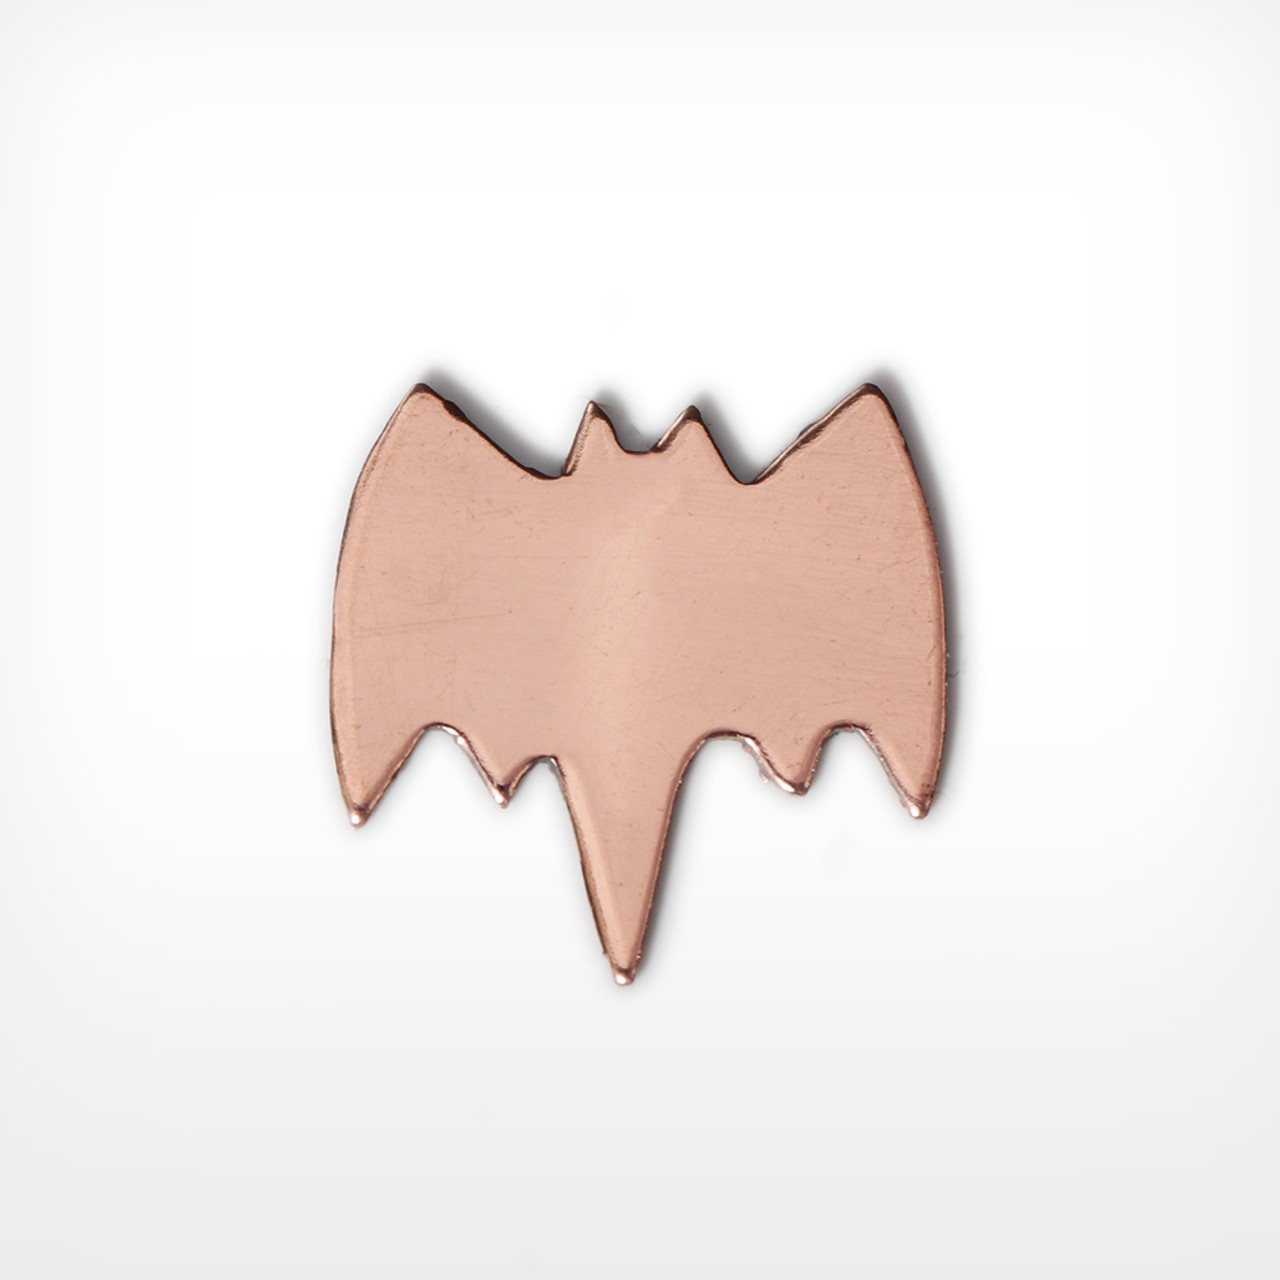 Copper Blank Bat Stamped Shape for Enamelling & Other Crafts